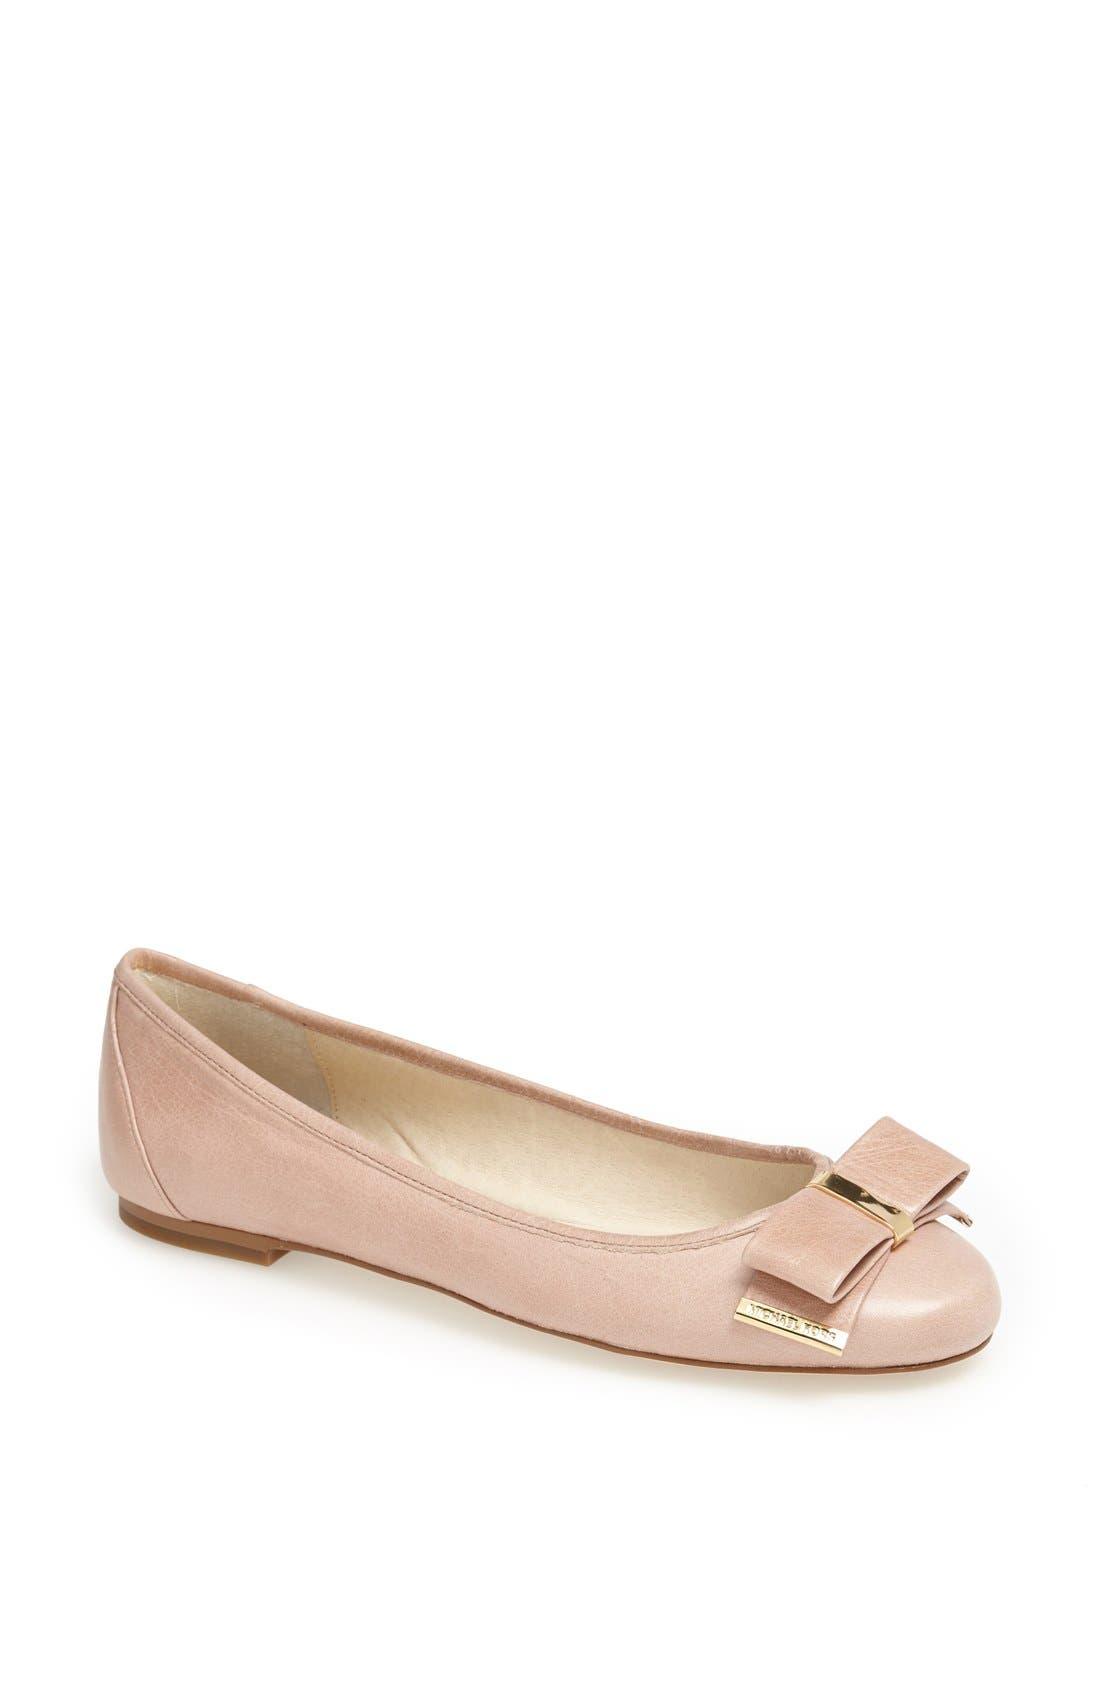 Main Image - MICHAEL Michael Kors 'Kiera' Leather Ballet Flat